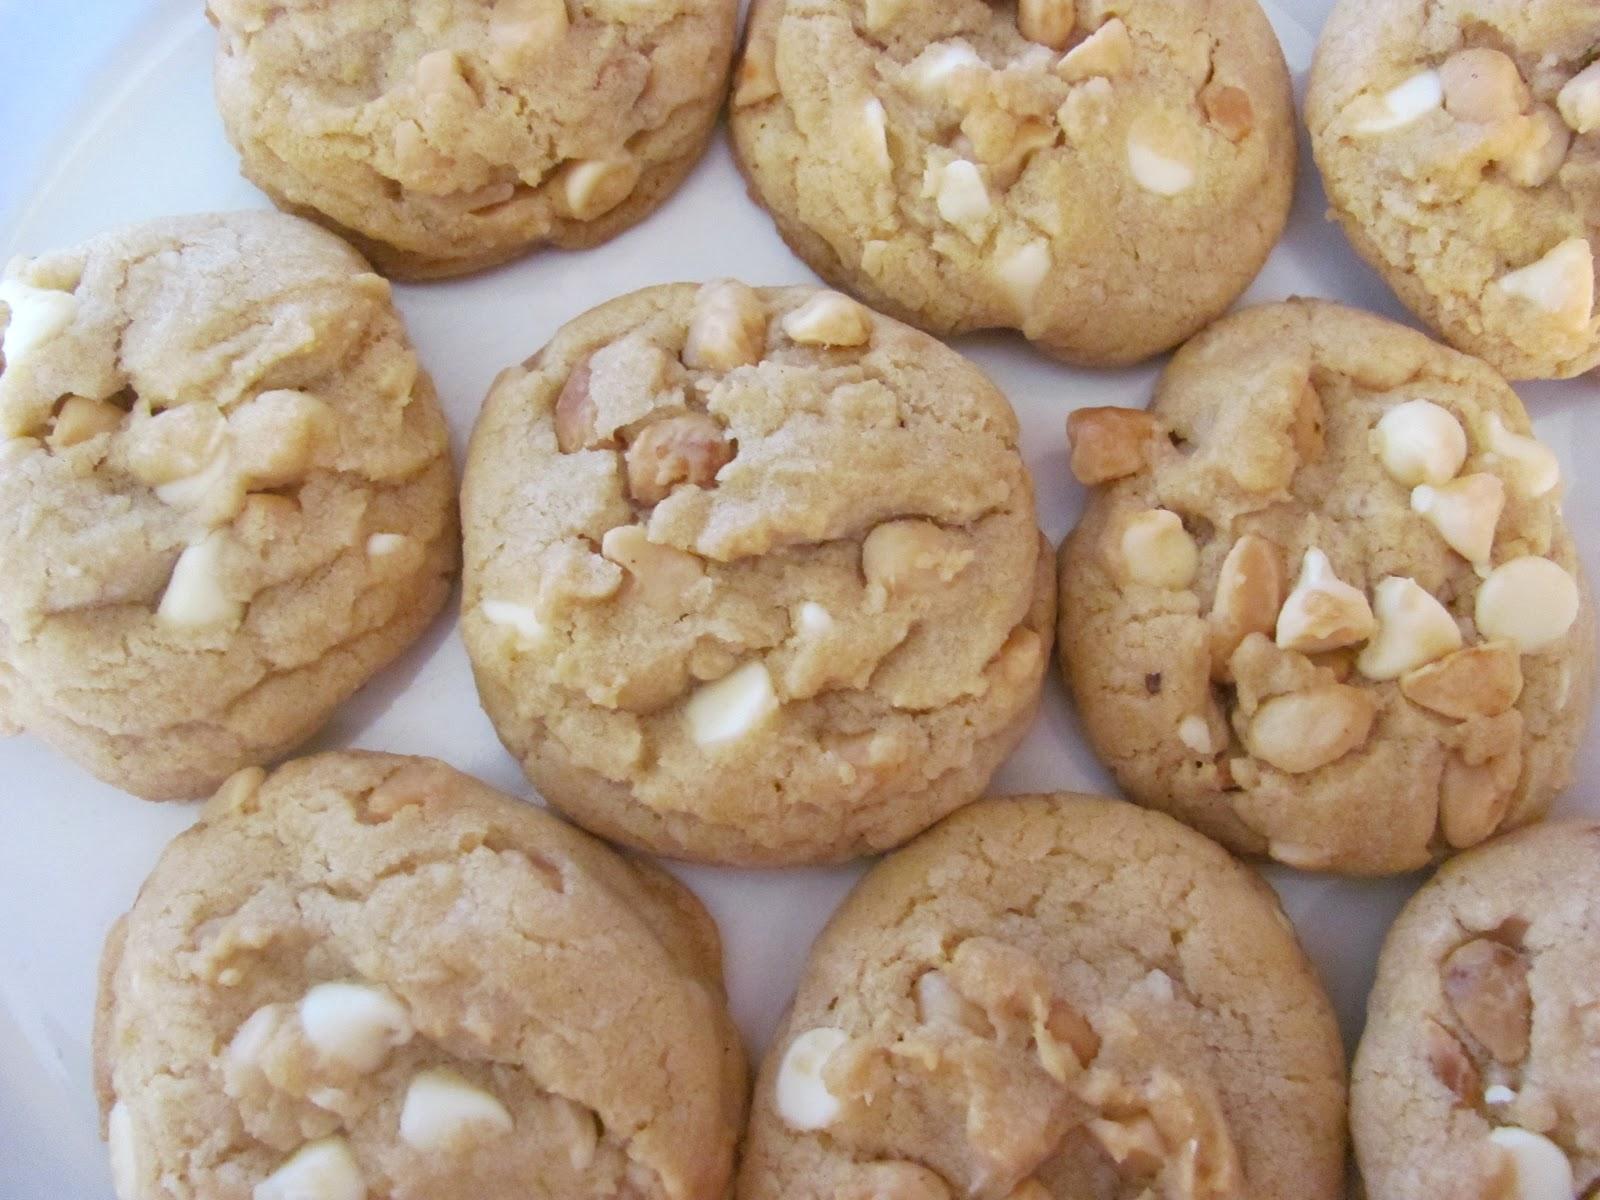 Creating Nirvana: Easy White Chocolate Macadamia Nut Cookies